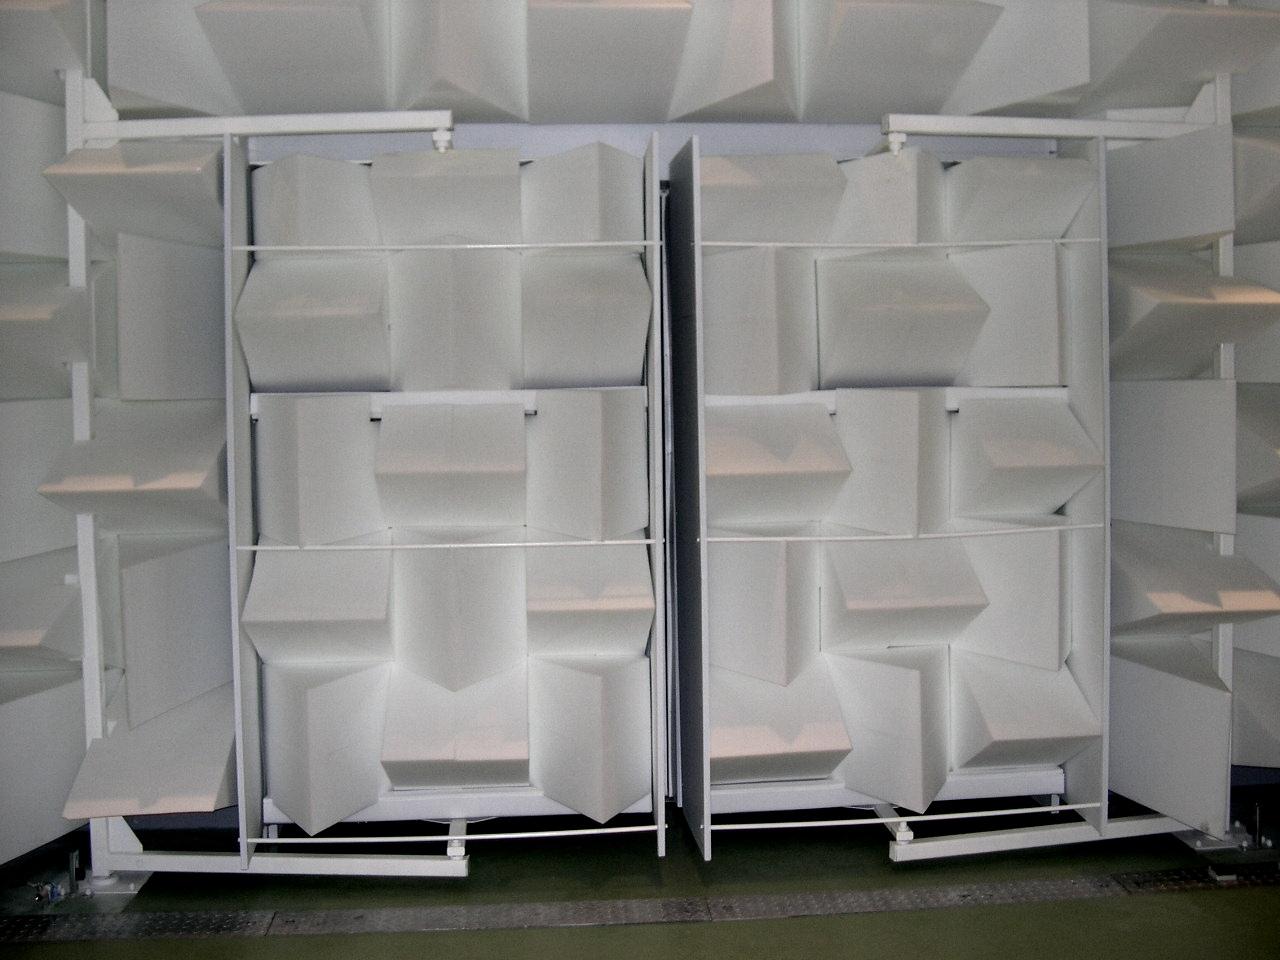 comment isoler une porte du bruit maison design mail. Black Bedroom Furniture Sets. Home Design Ideas